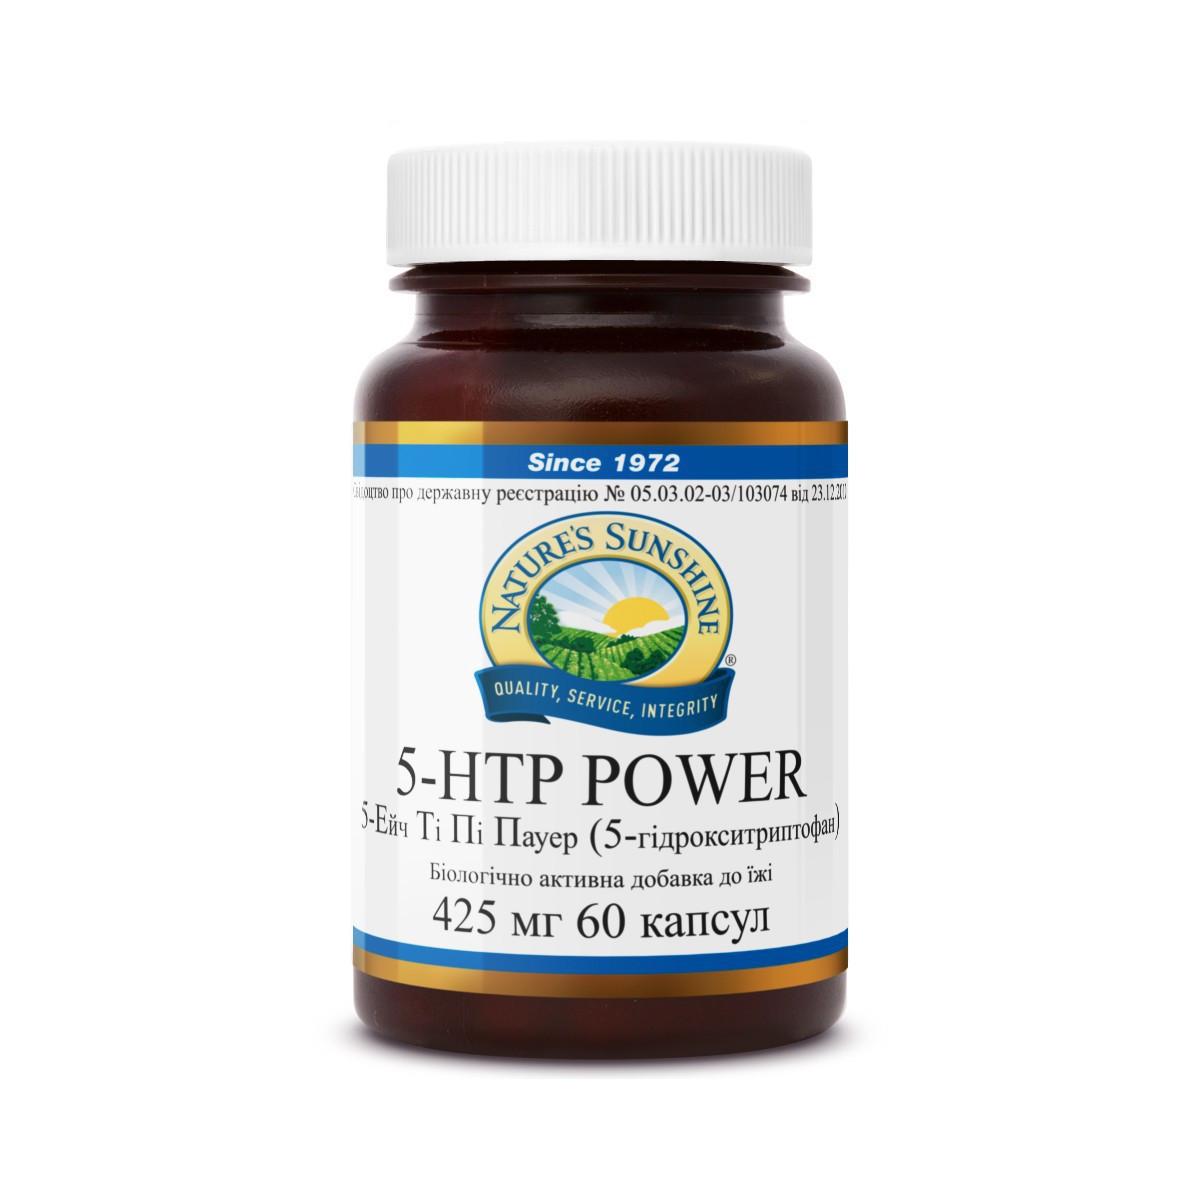 5-HTP Power 5-ЭйчТиПи Пауэр (5-гидрокситриптофан), NSP, США